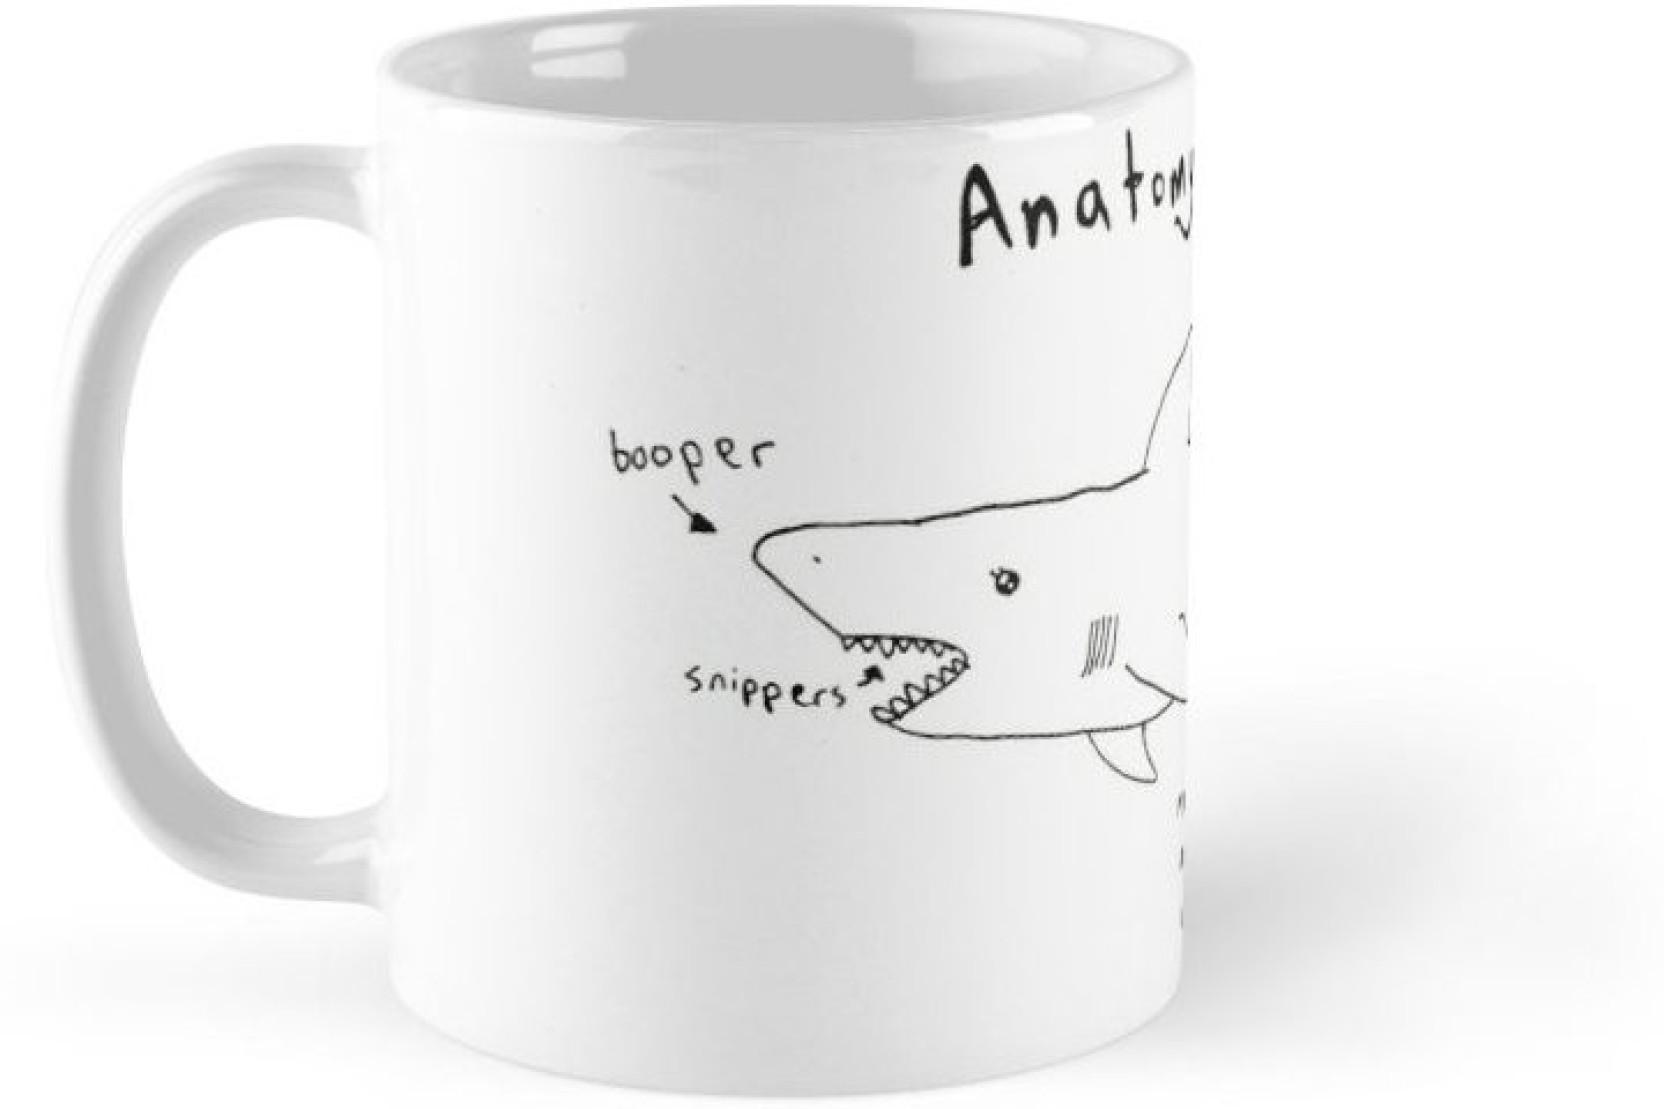 Shopsmeade Anatomy Of A Shark Humor Fun 32318 Ceramic Mug Price